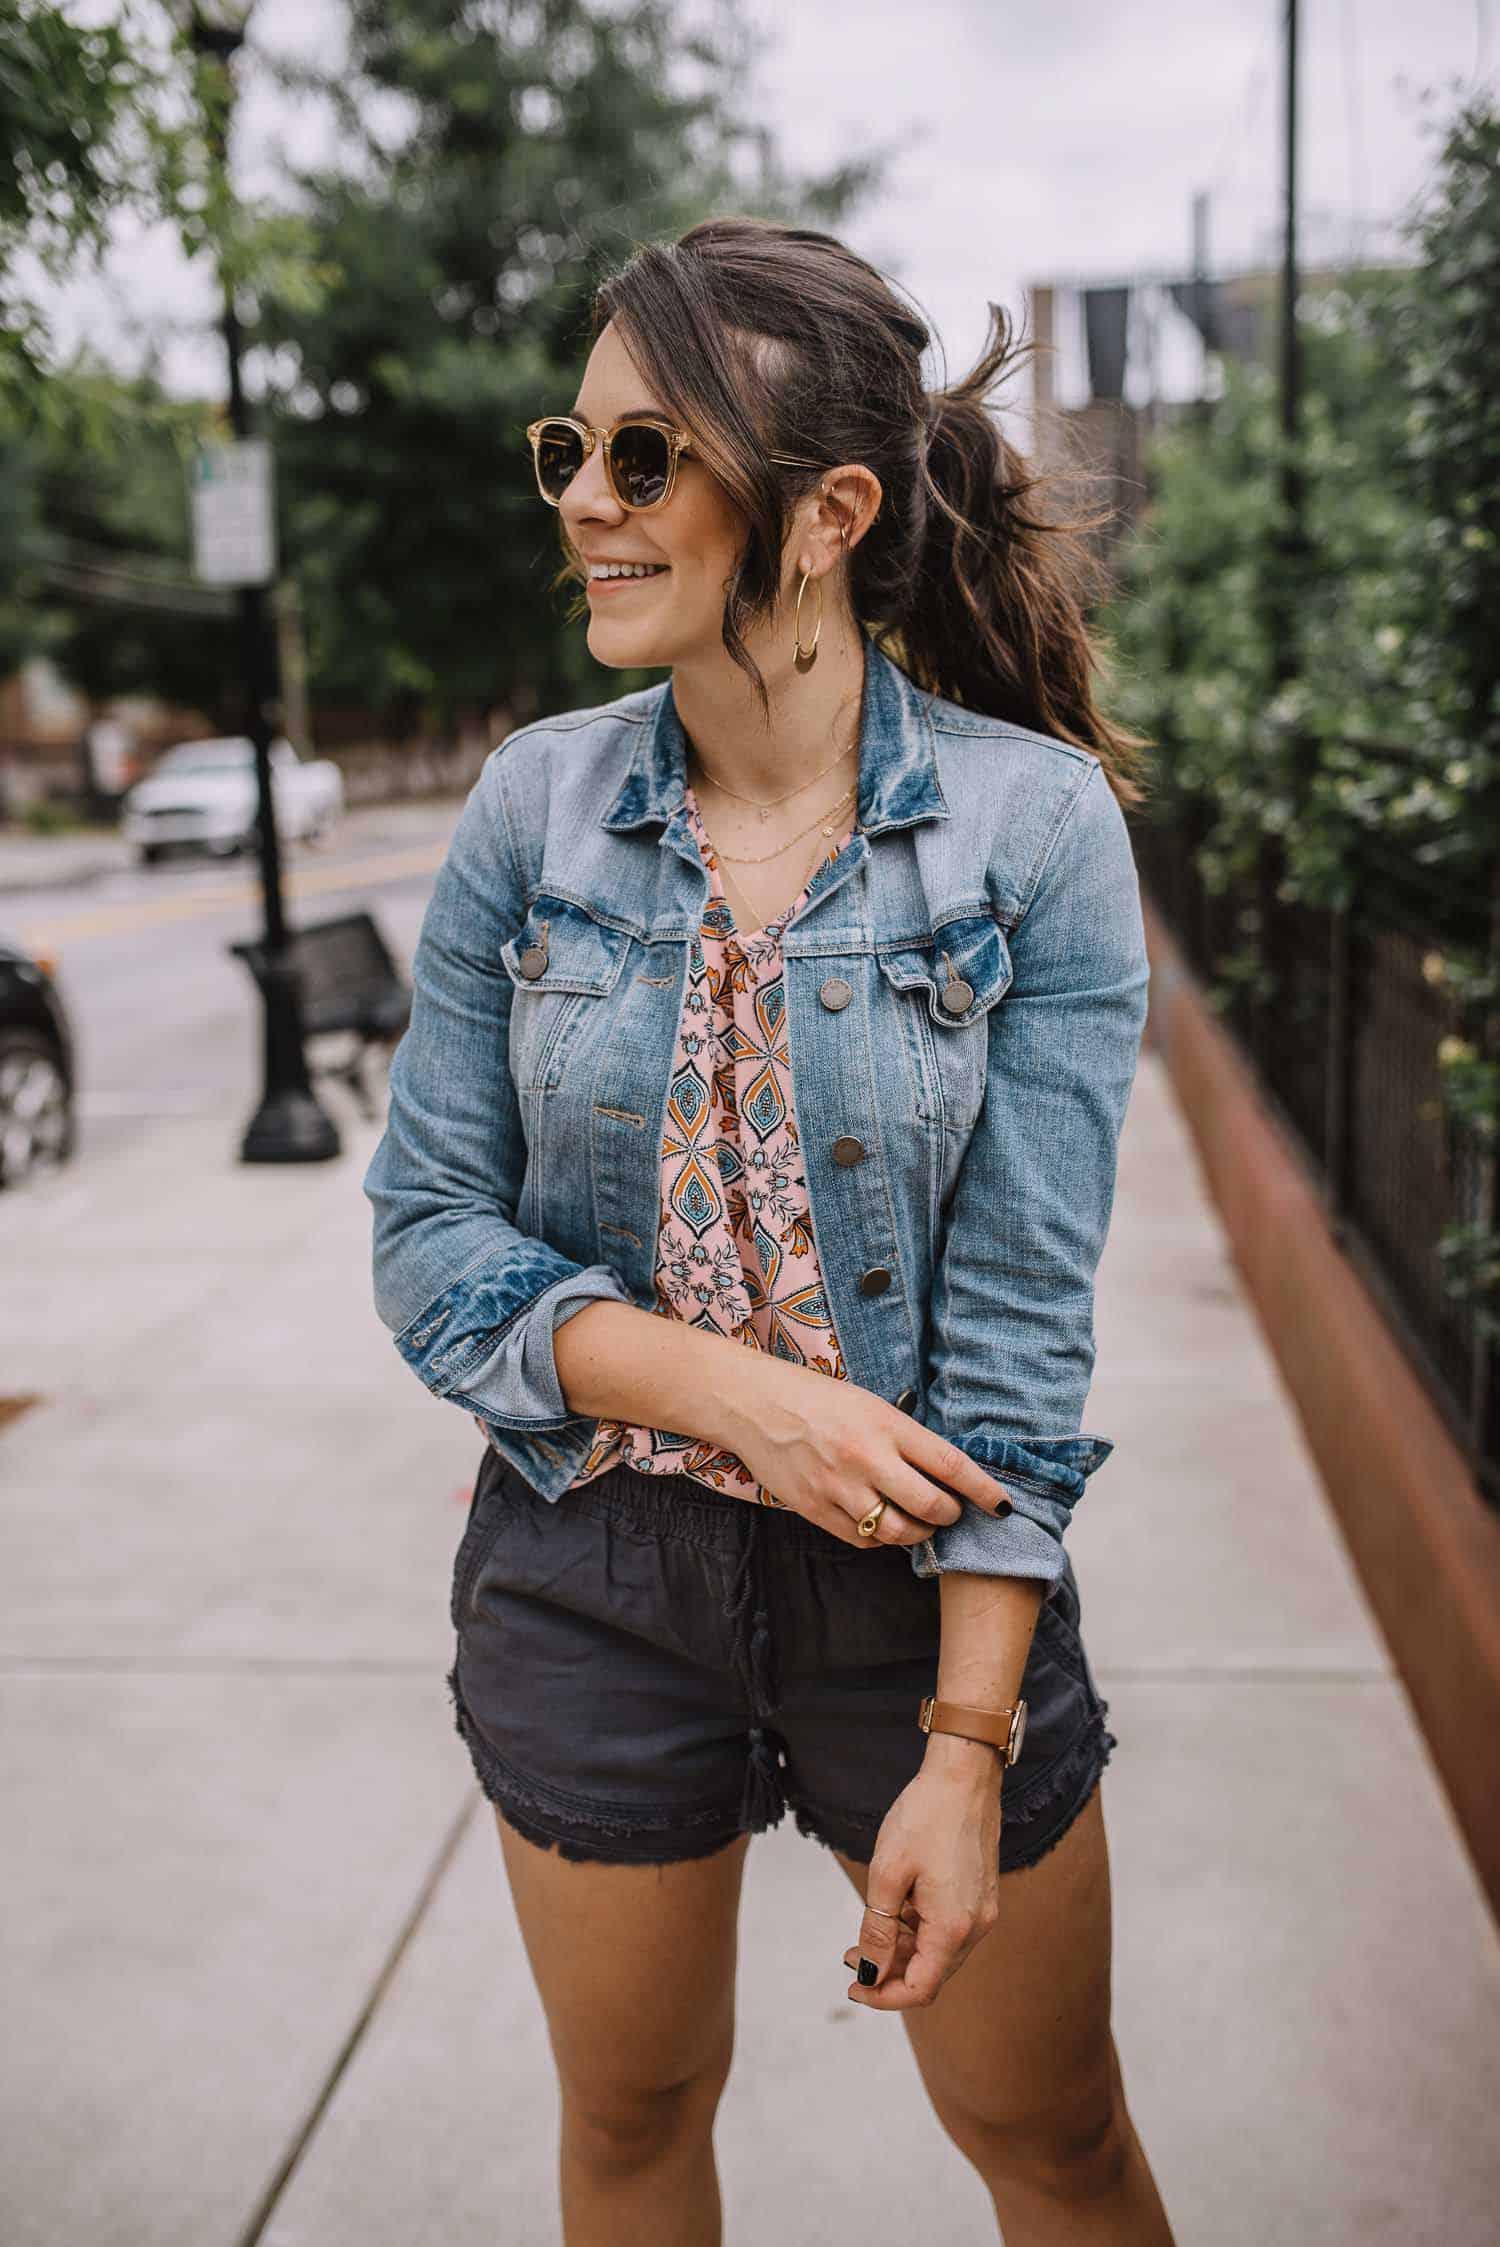 LOFT Kaleidoscope Top, how to style pull on shorts, denim jacket - My Style Vita